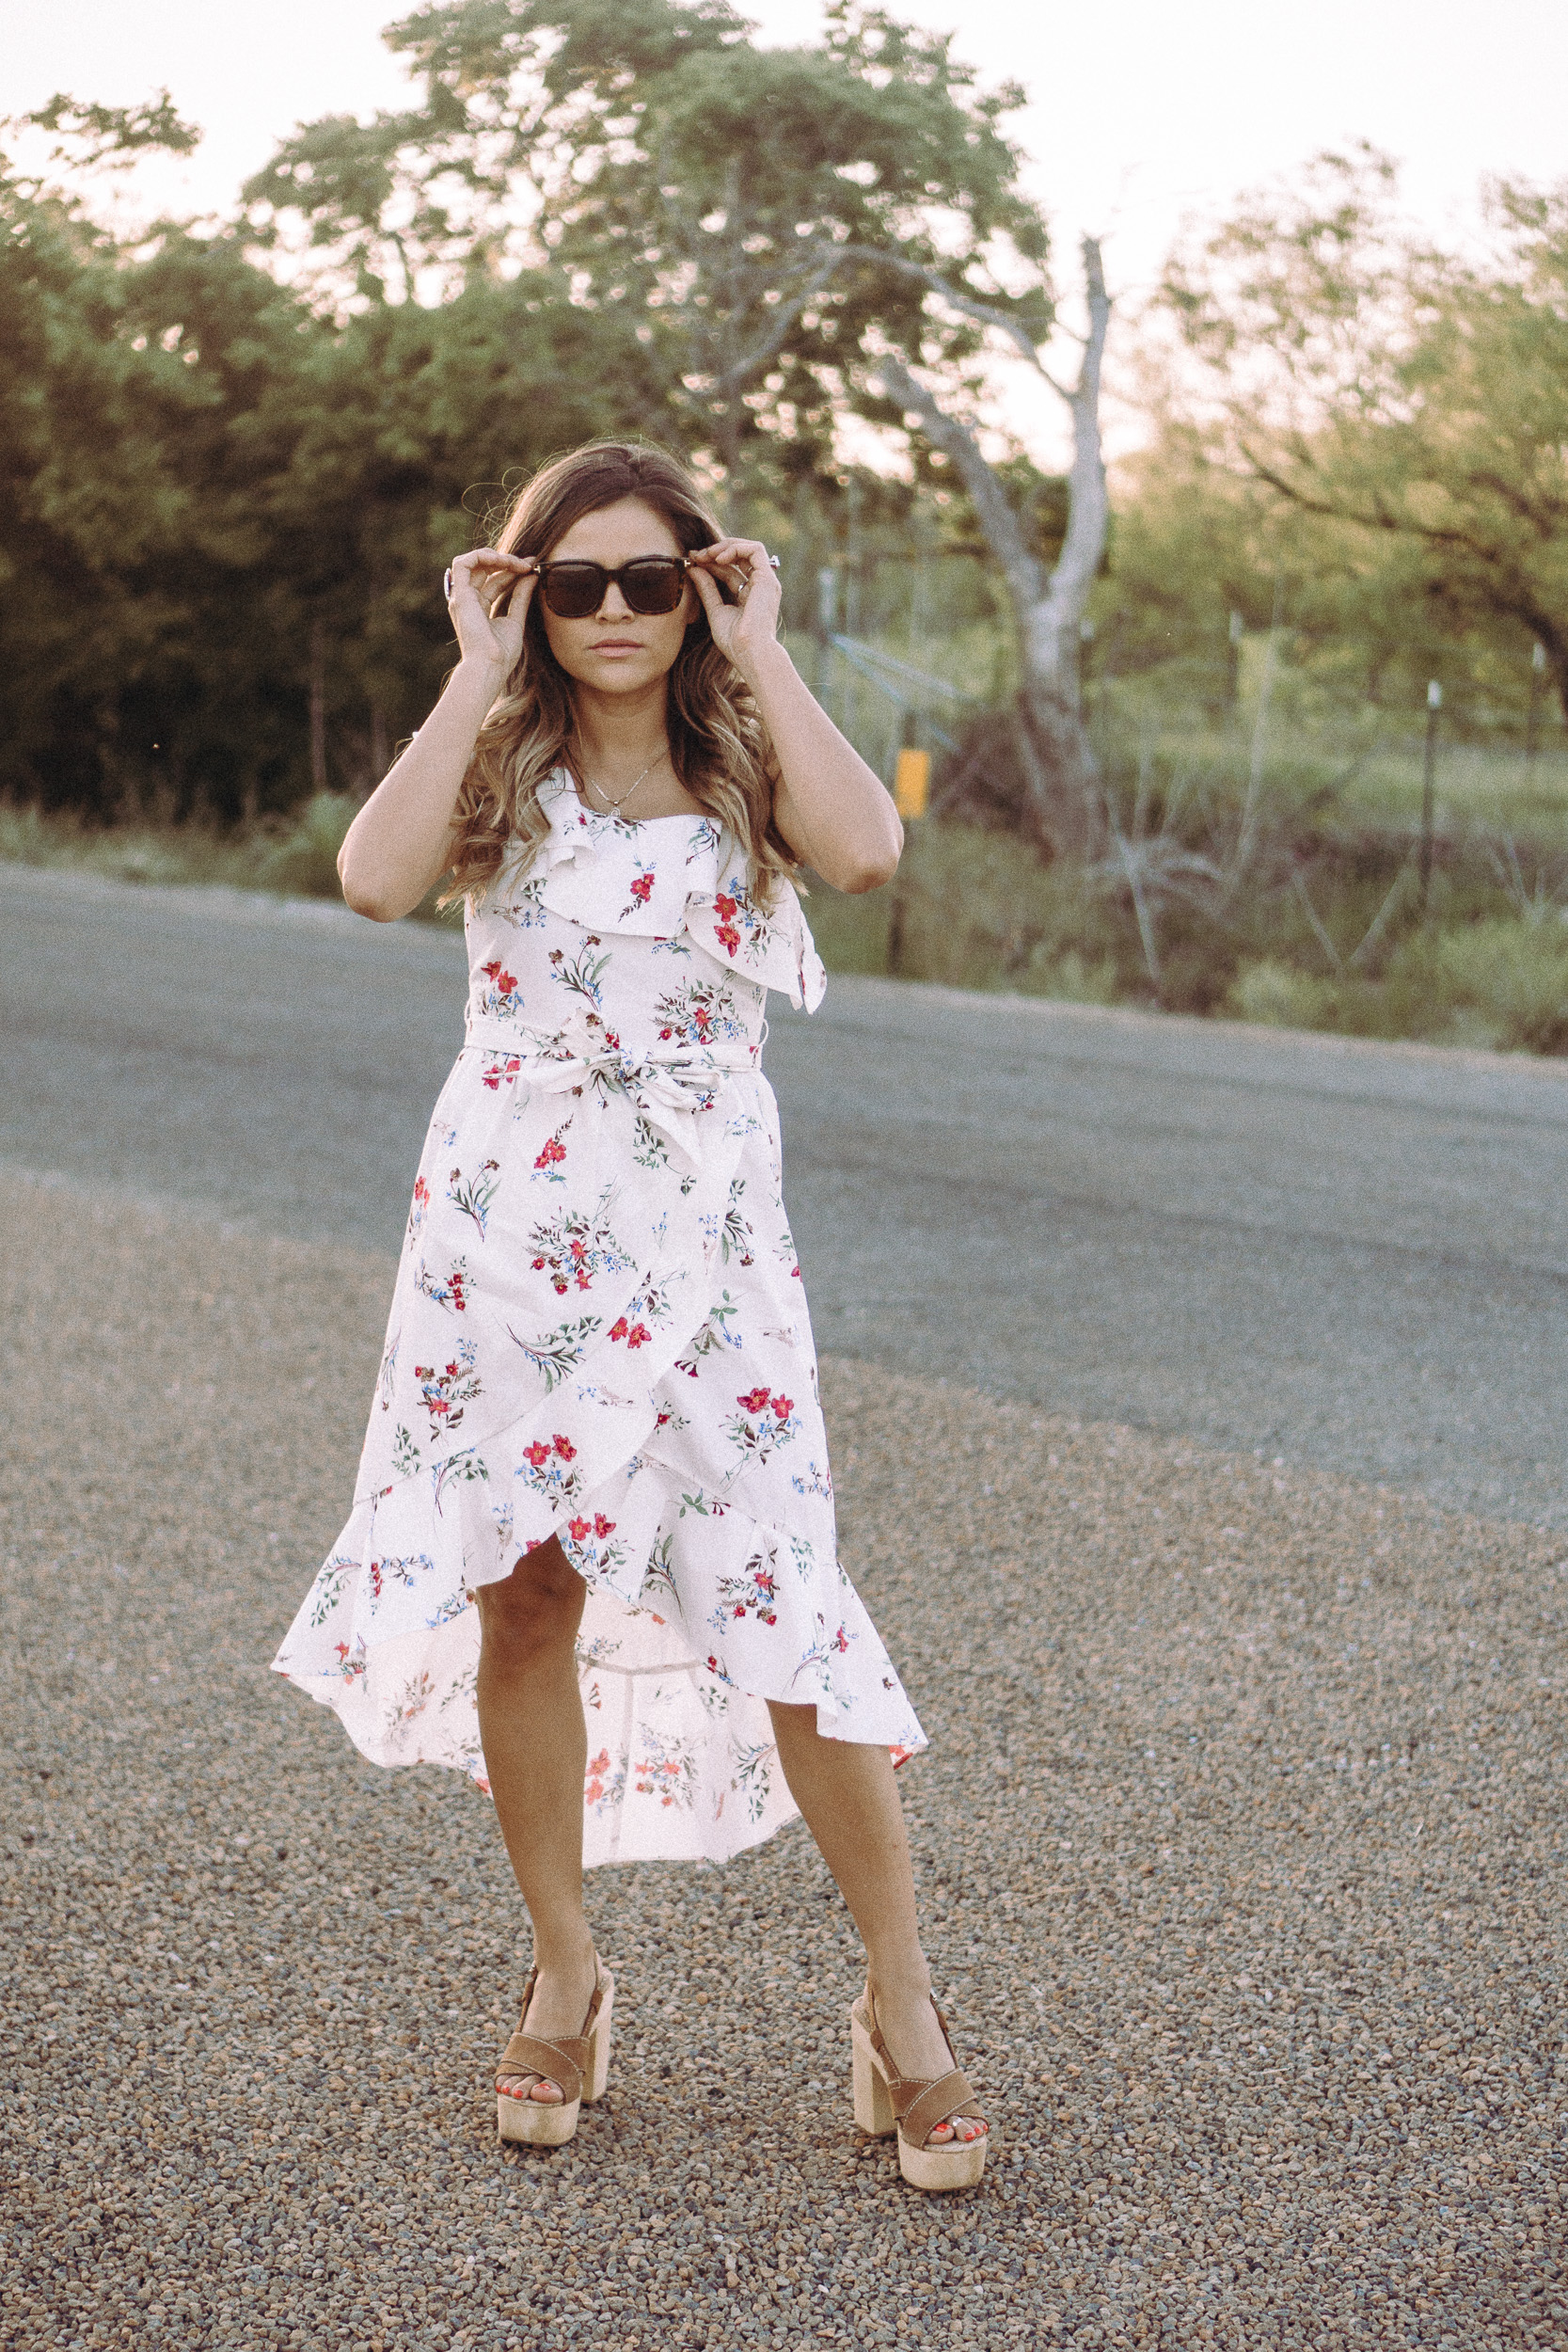 Floral Dress - Plus 5 Spring Dresses I'm loving